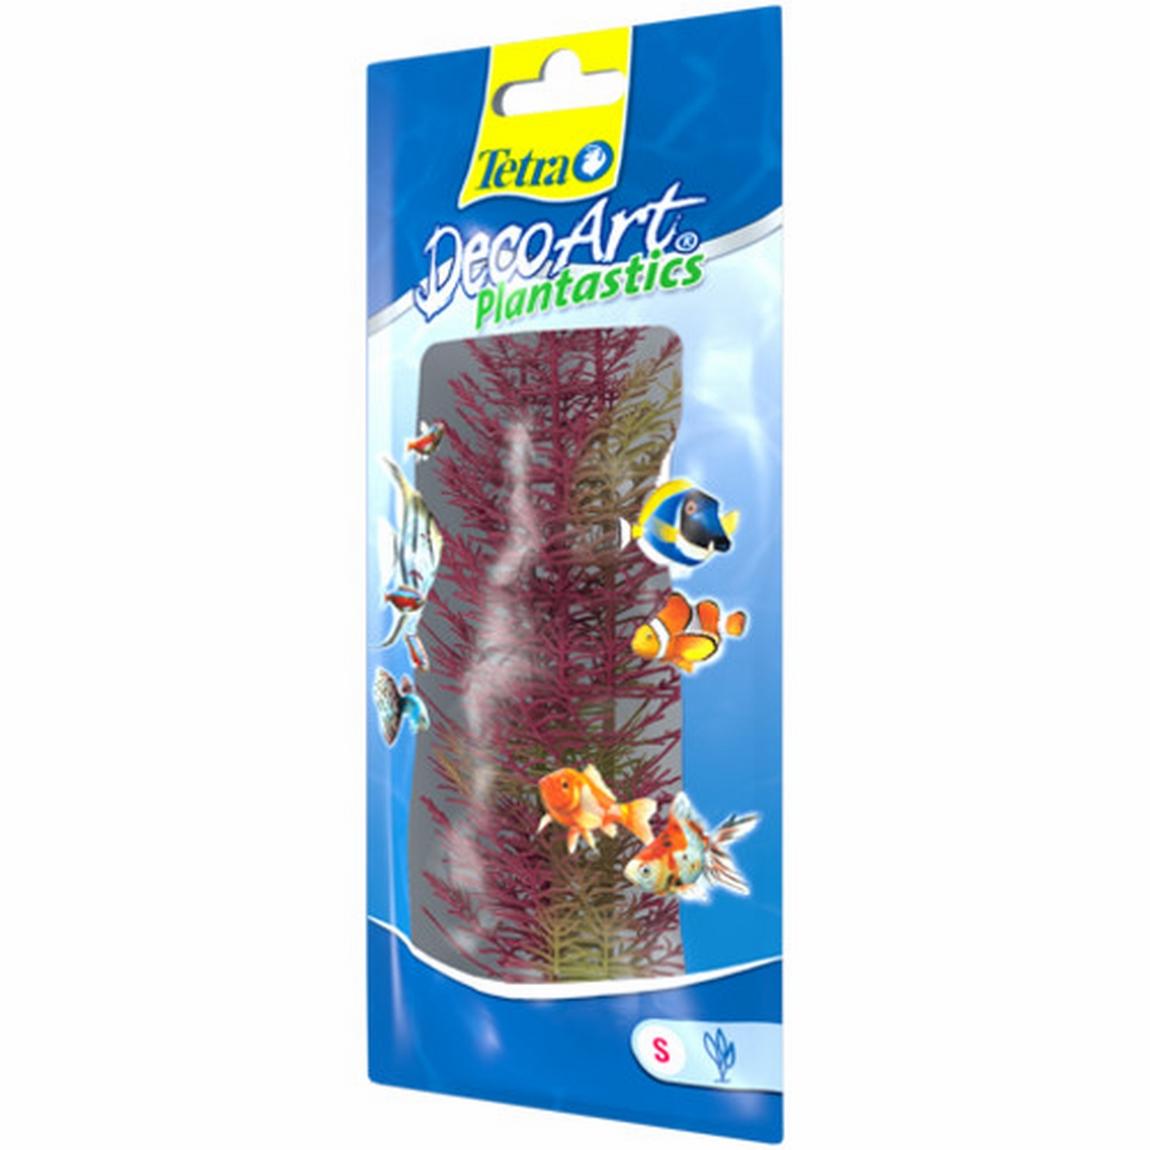 Tetra Planta Decoart Red Foxtail S 15 Cm imagine